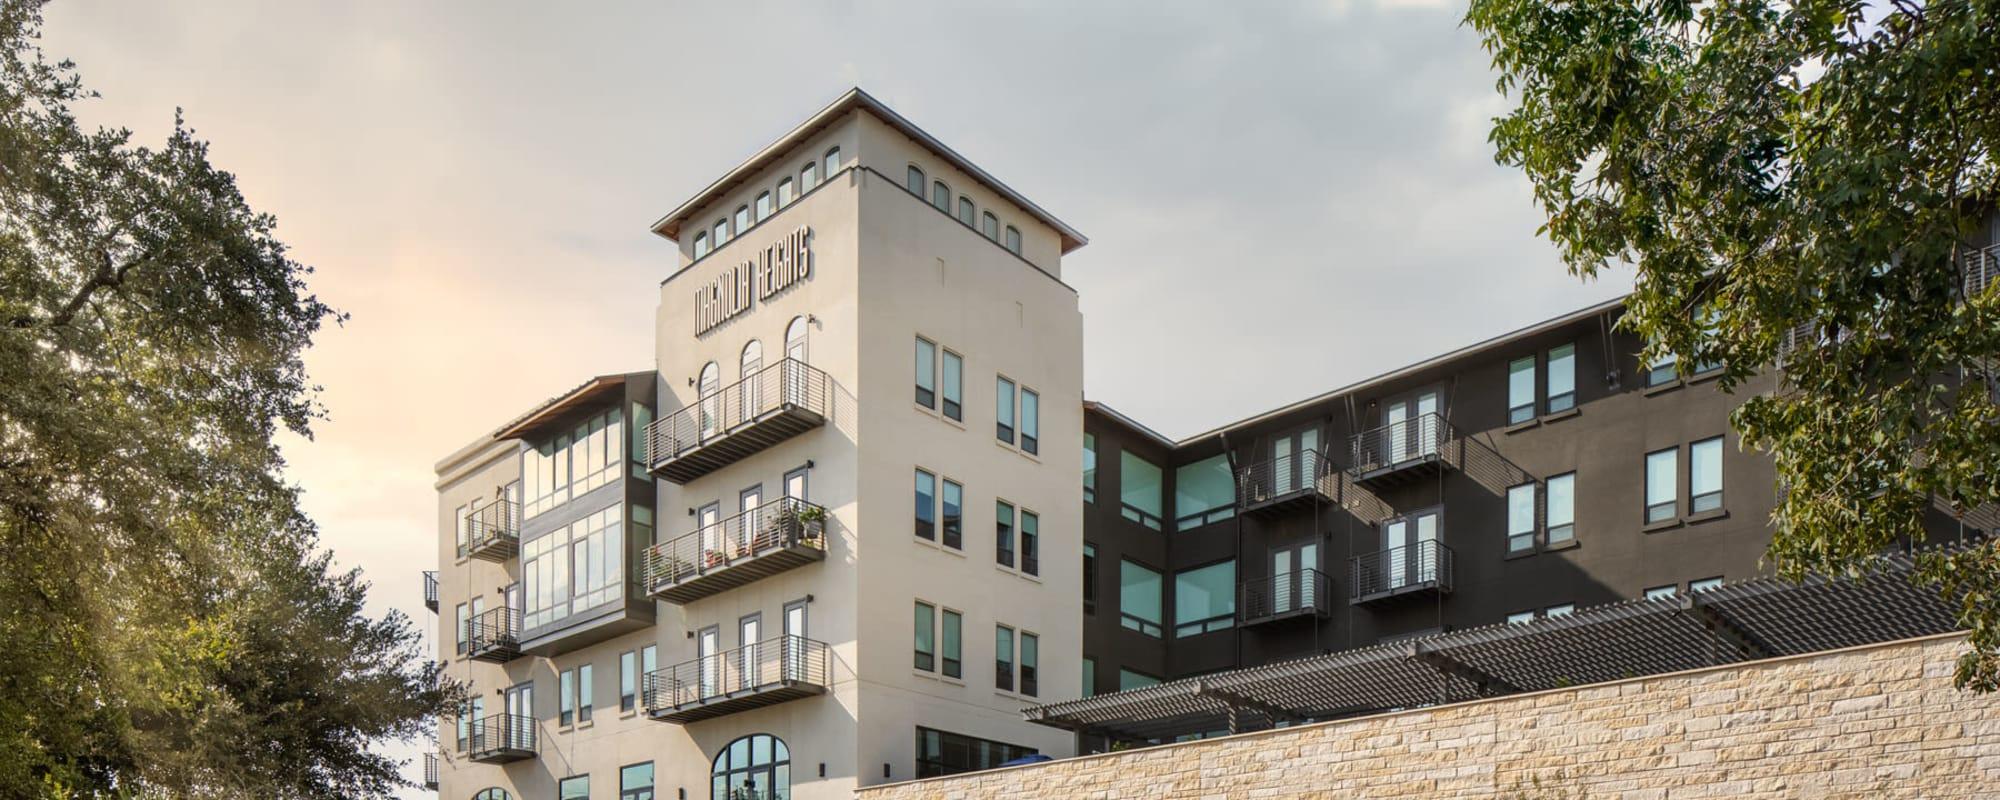 Apartments at Magnolia Heights in San Antonio, Texas